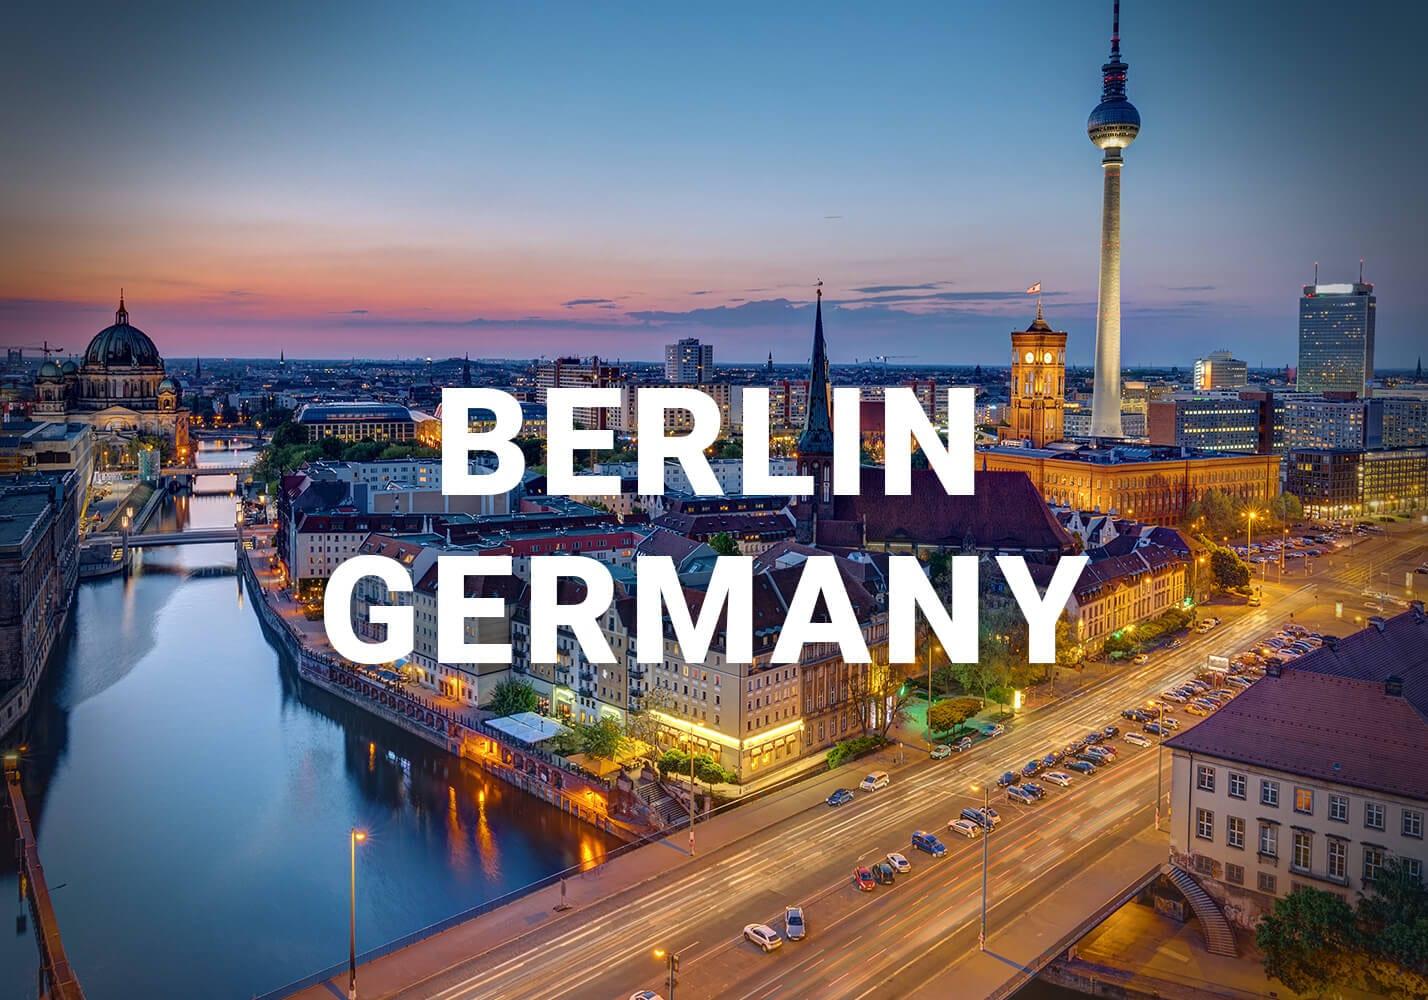 17-21 April 2019 - Berlin, Germany